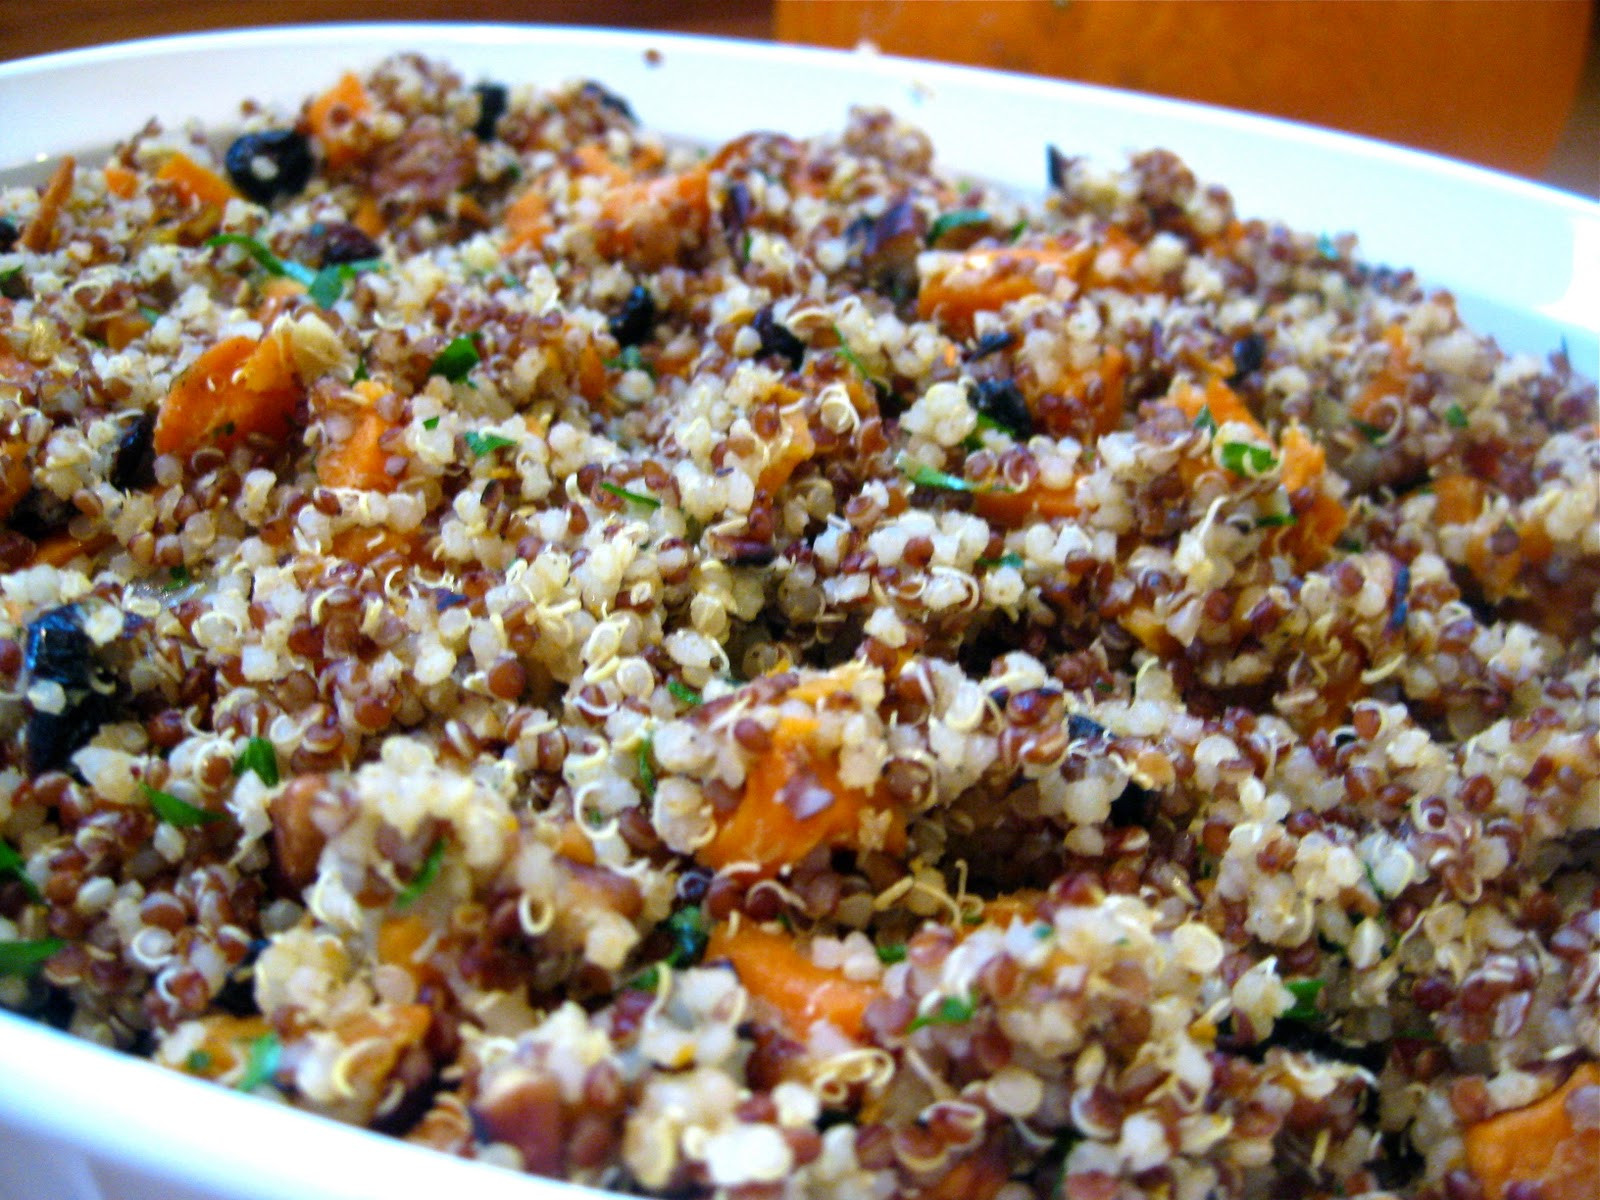 Healthy Stuffing Recipes For Thanksgiving  Quinoa Stuffing Recipe Gluten Free & Vegan